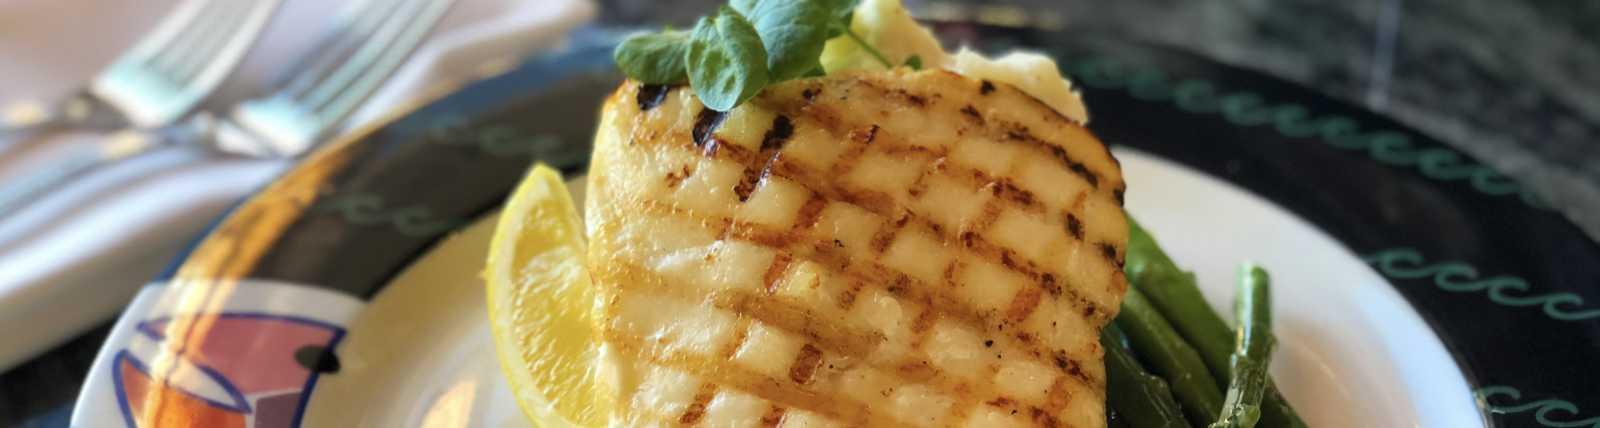 Fresh Alaska Halibut with Lemon Beurre Blanc and Fresh Chive Oil